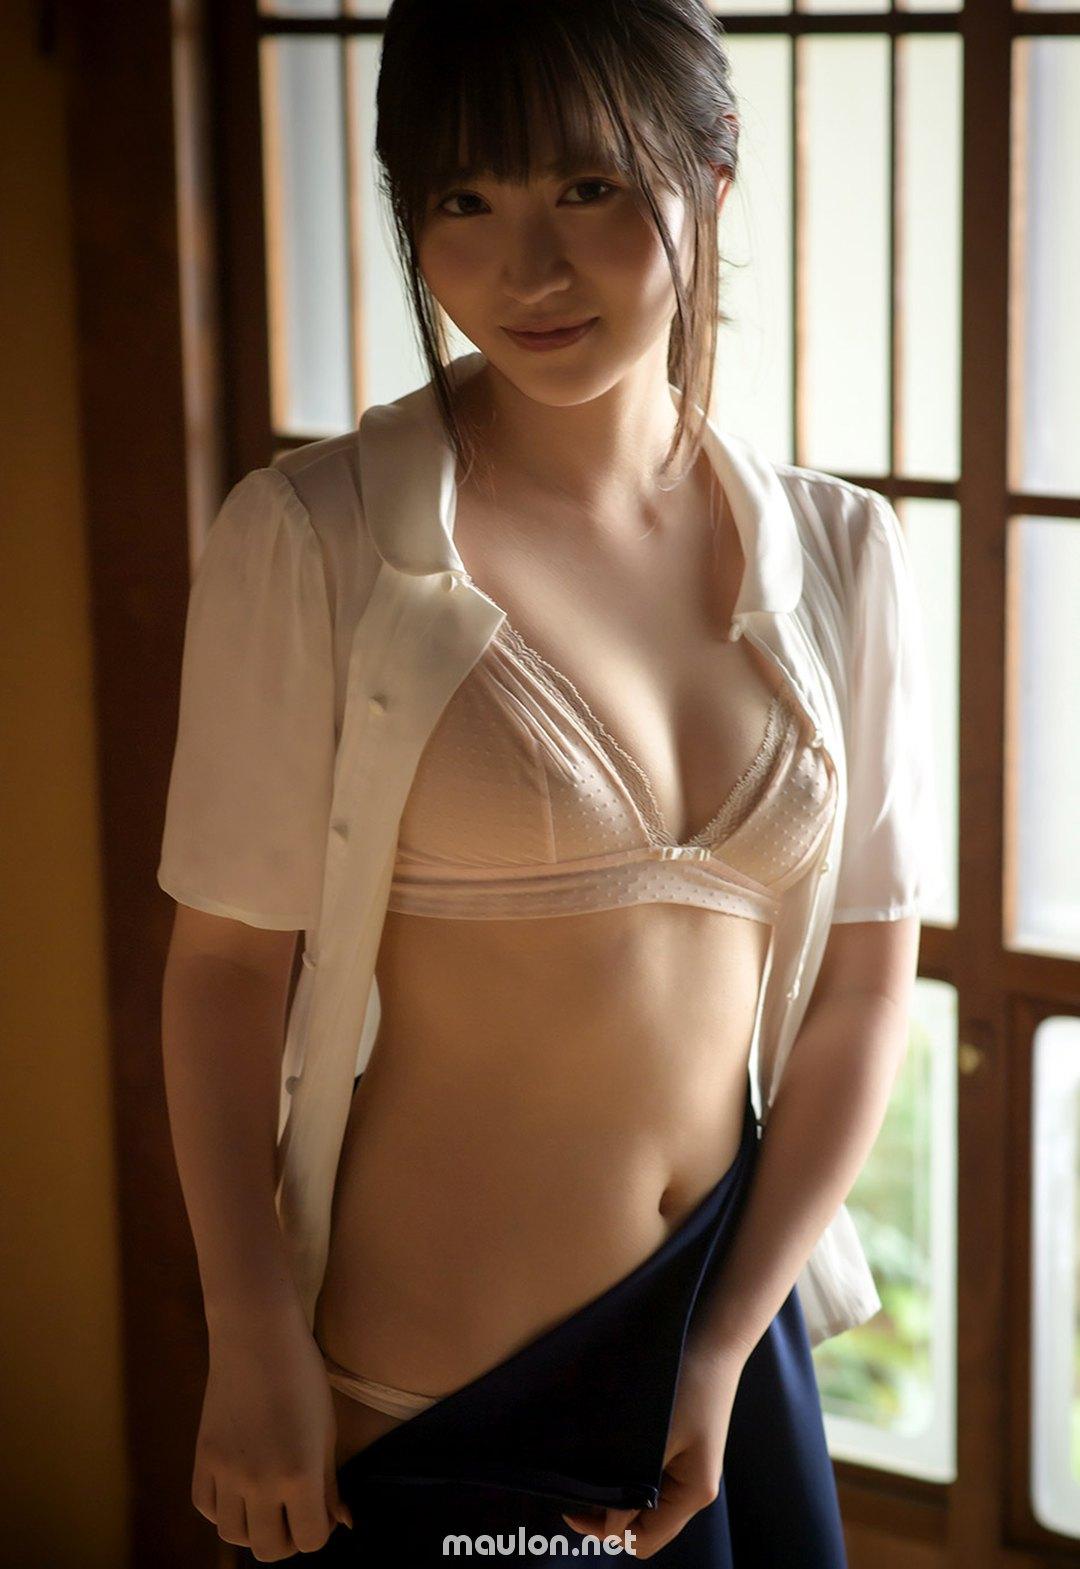 MauLon.Net - Ảnh sex idol jav Gái xinh Rikka Ono